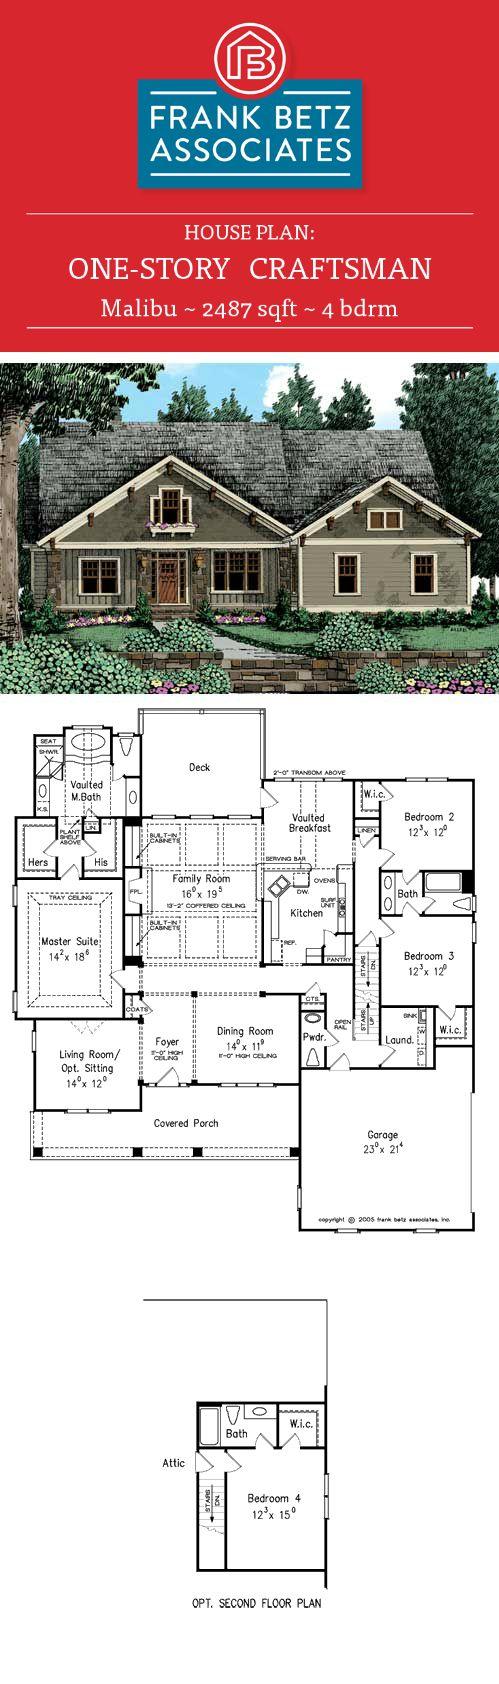 Malibu: 2487 sqft, 4 bdrm, one-story craftsman house plan design ...